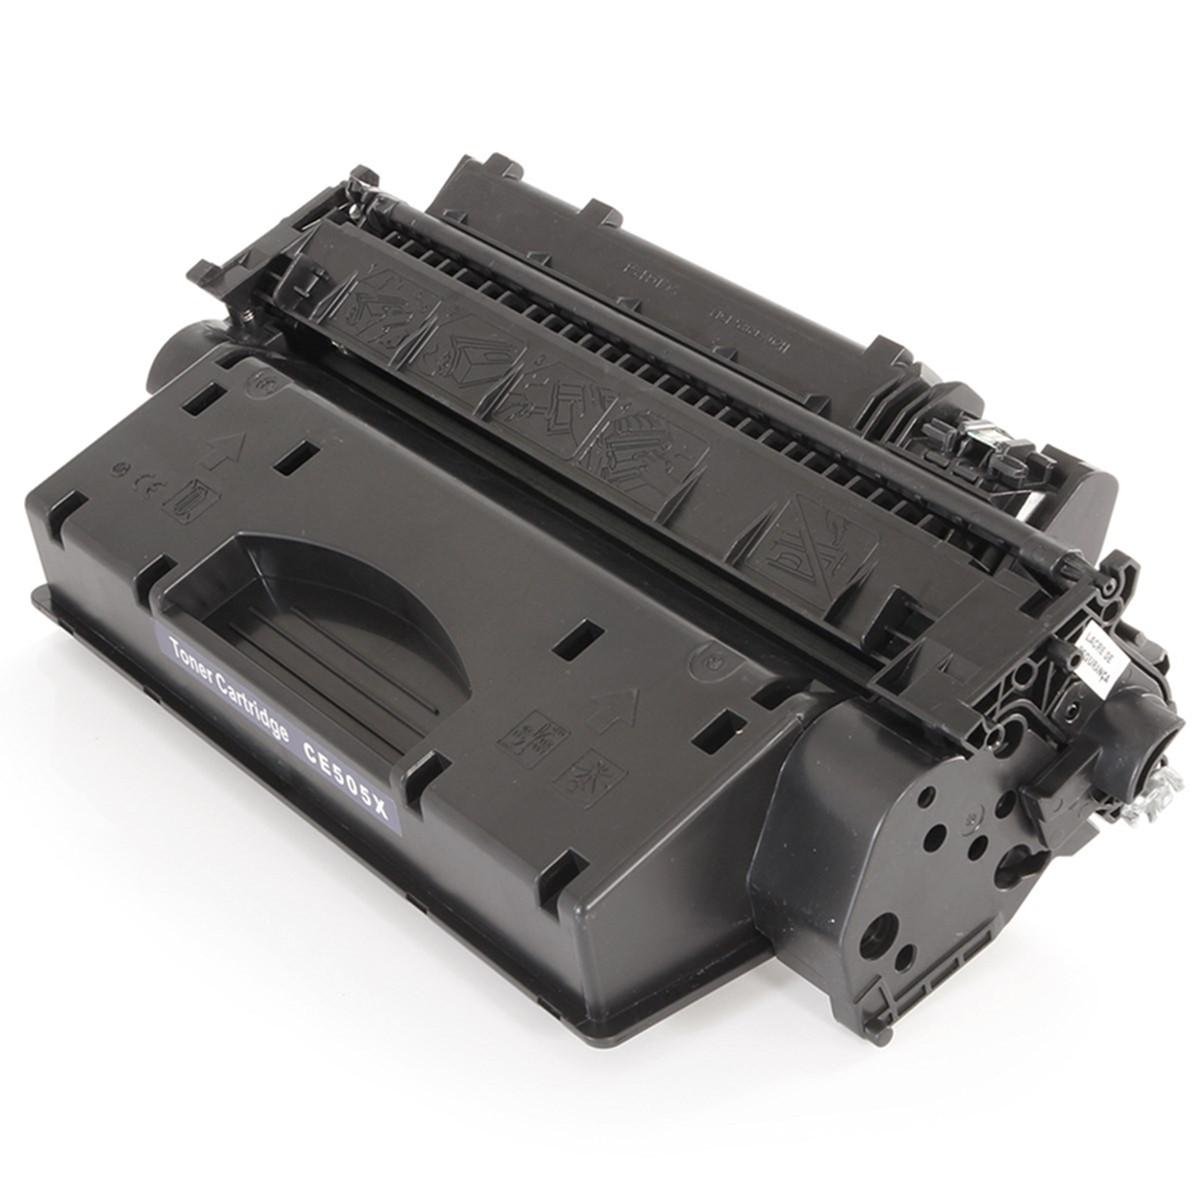 Toner Compatível HP CE505X 05X Universal | P2055 P2055N P2055DN P2055X | Premium Quality